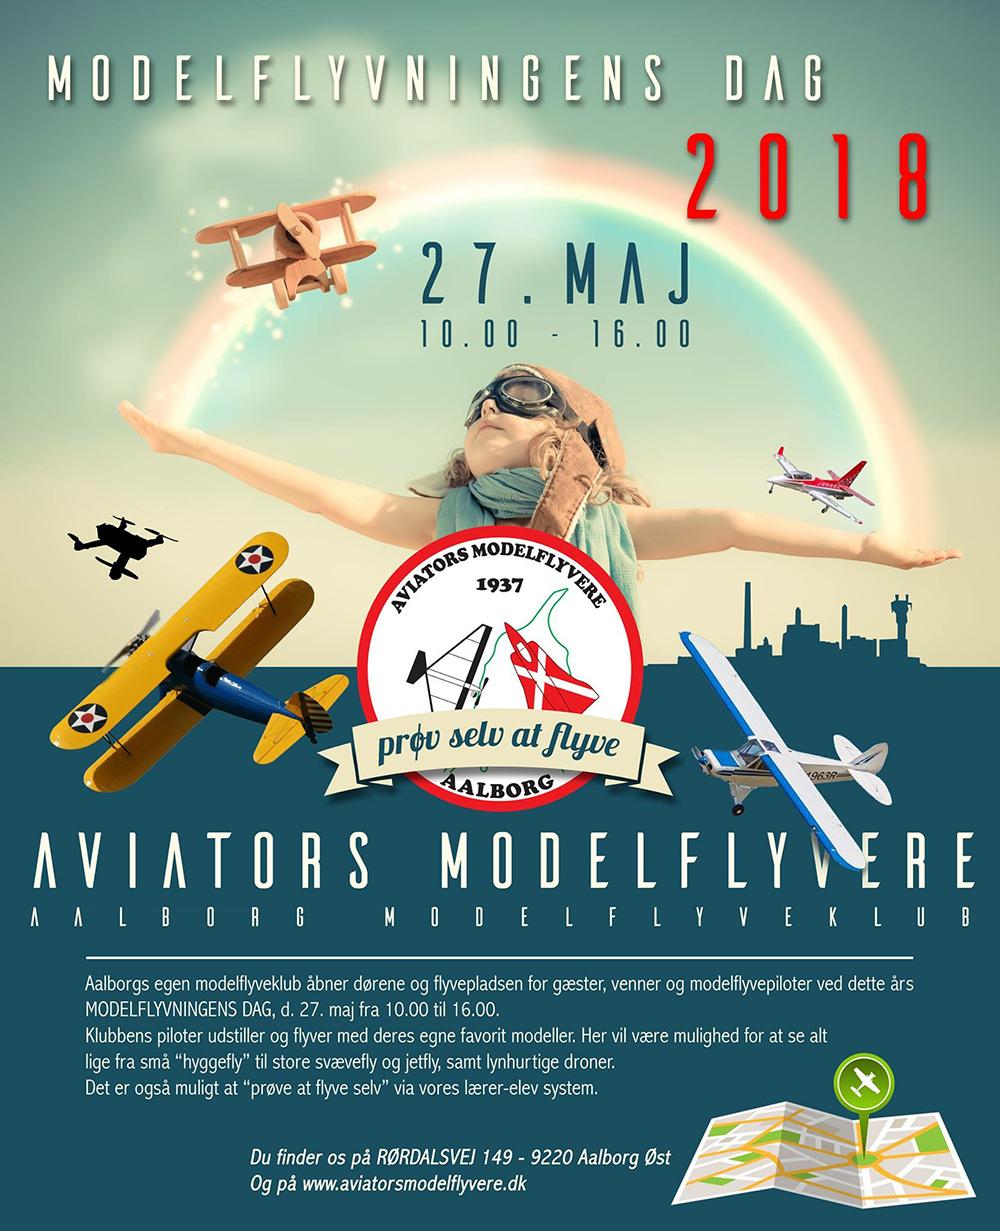 Modelflyvningens Dag